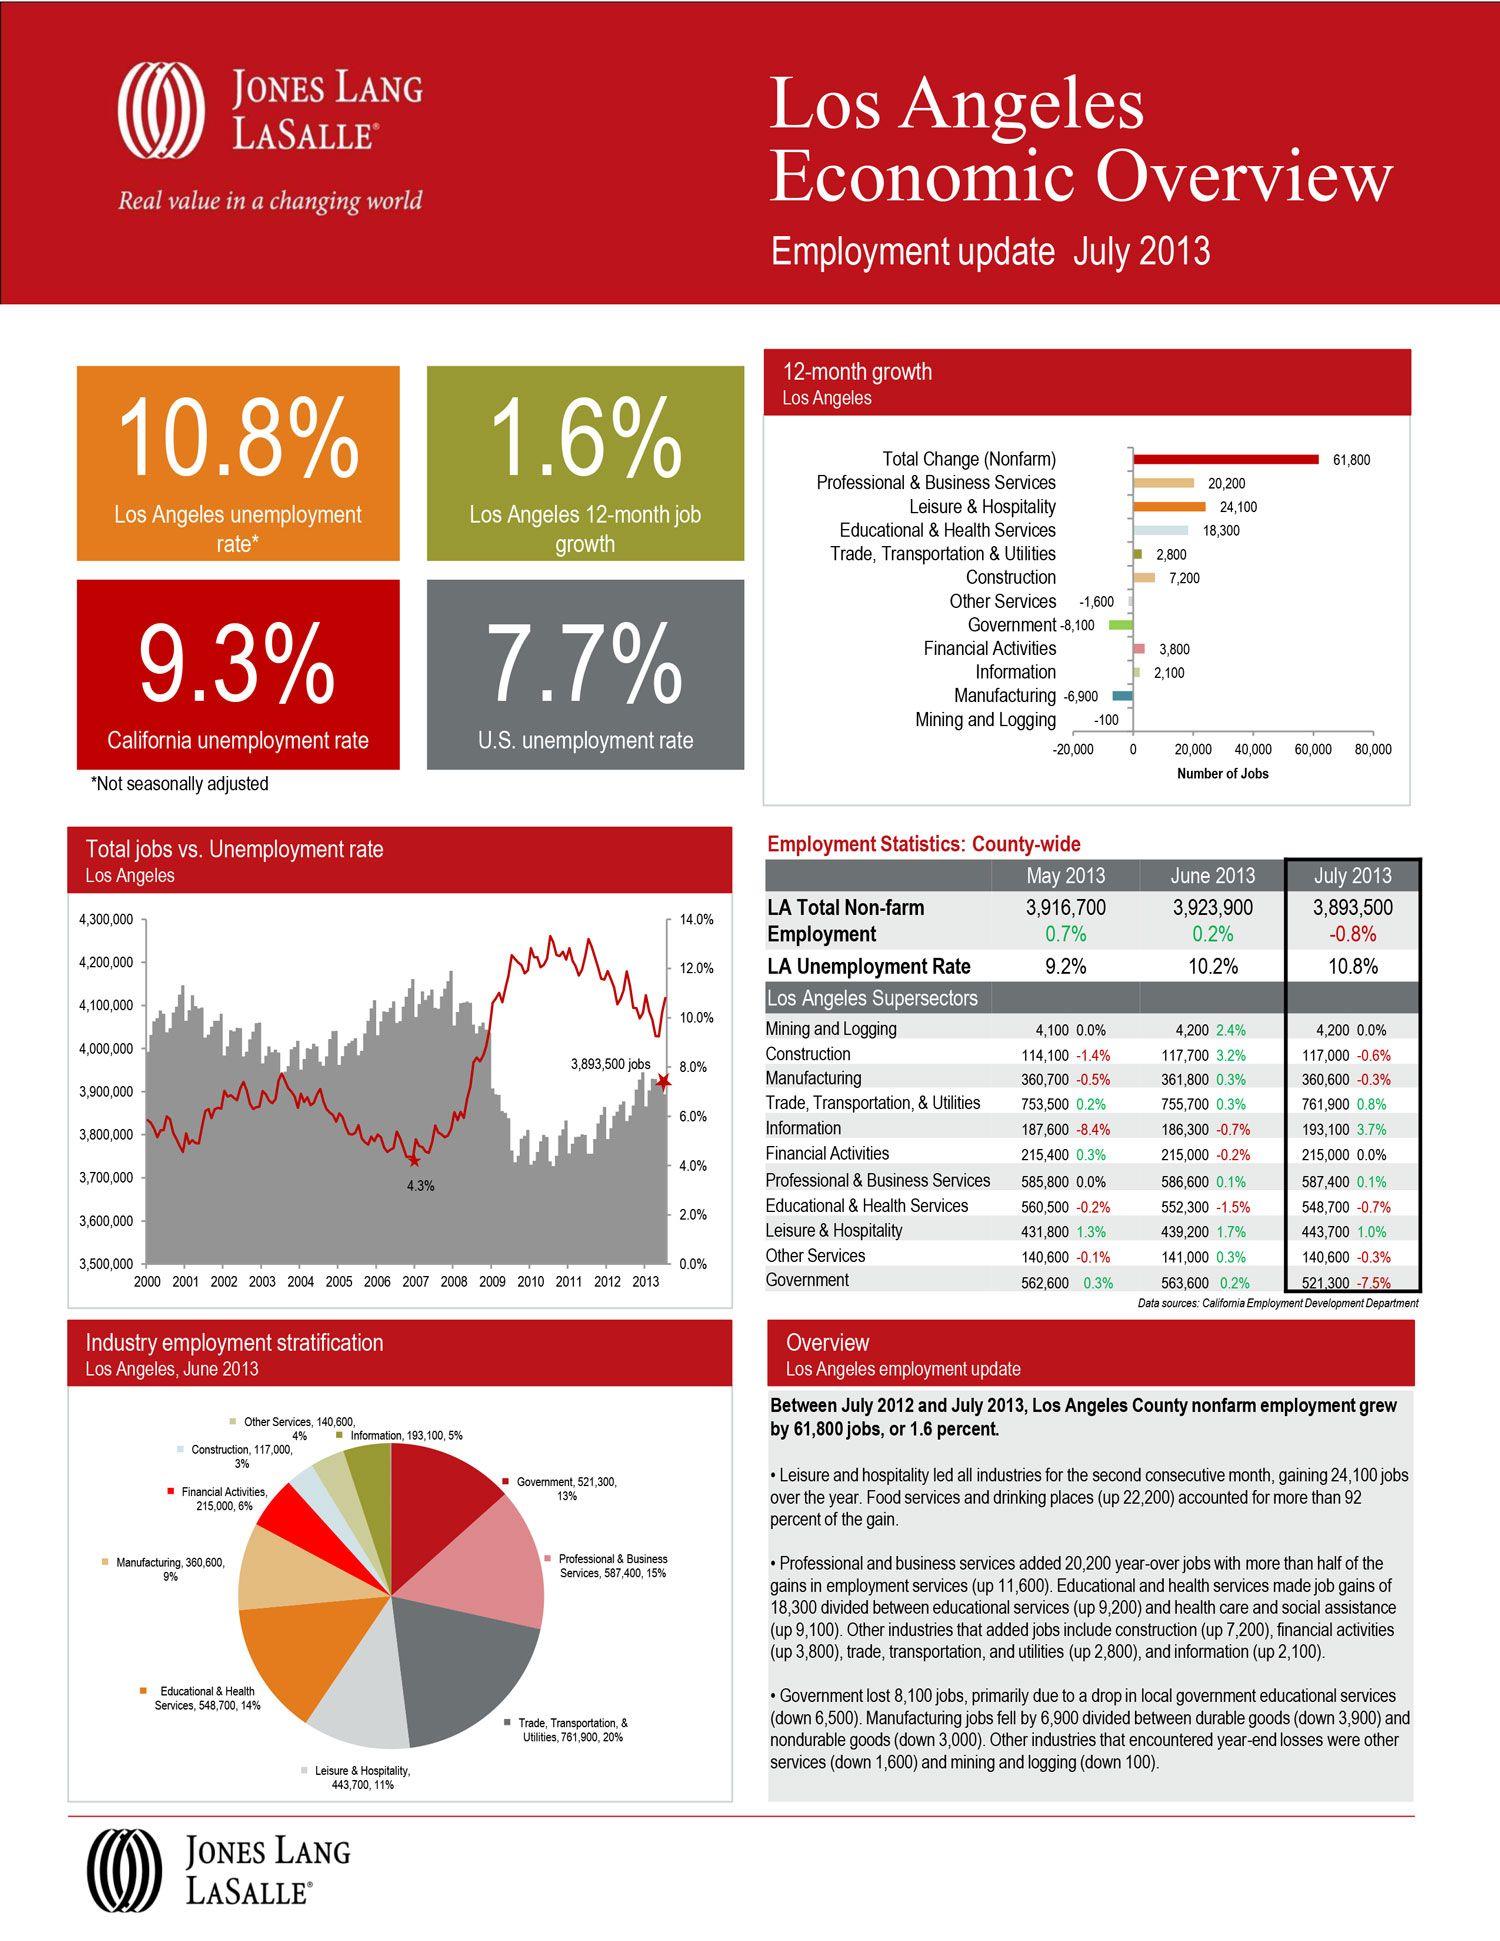 Los Angeles Economic Overview July 2013 Employment Statistics Los Angeles Employment